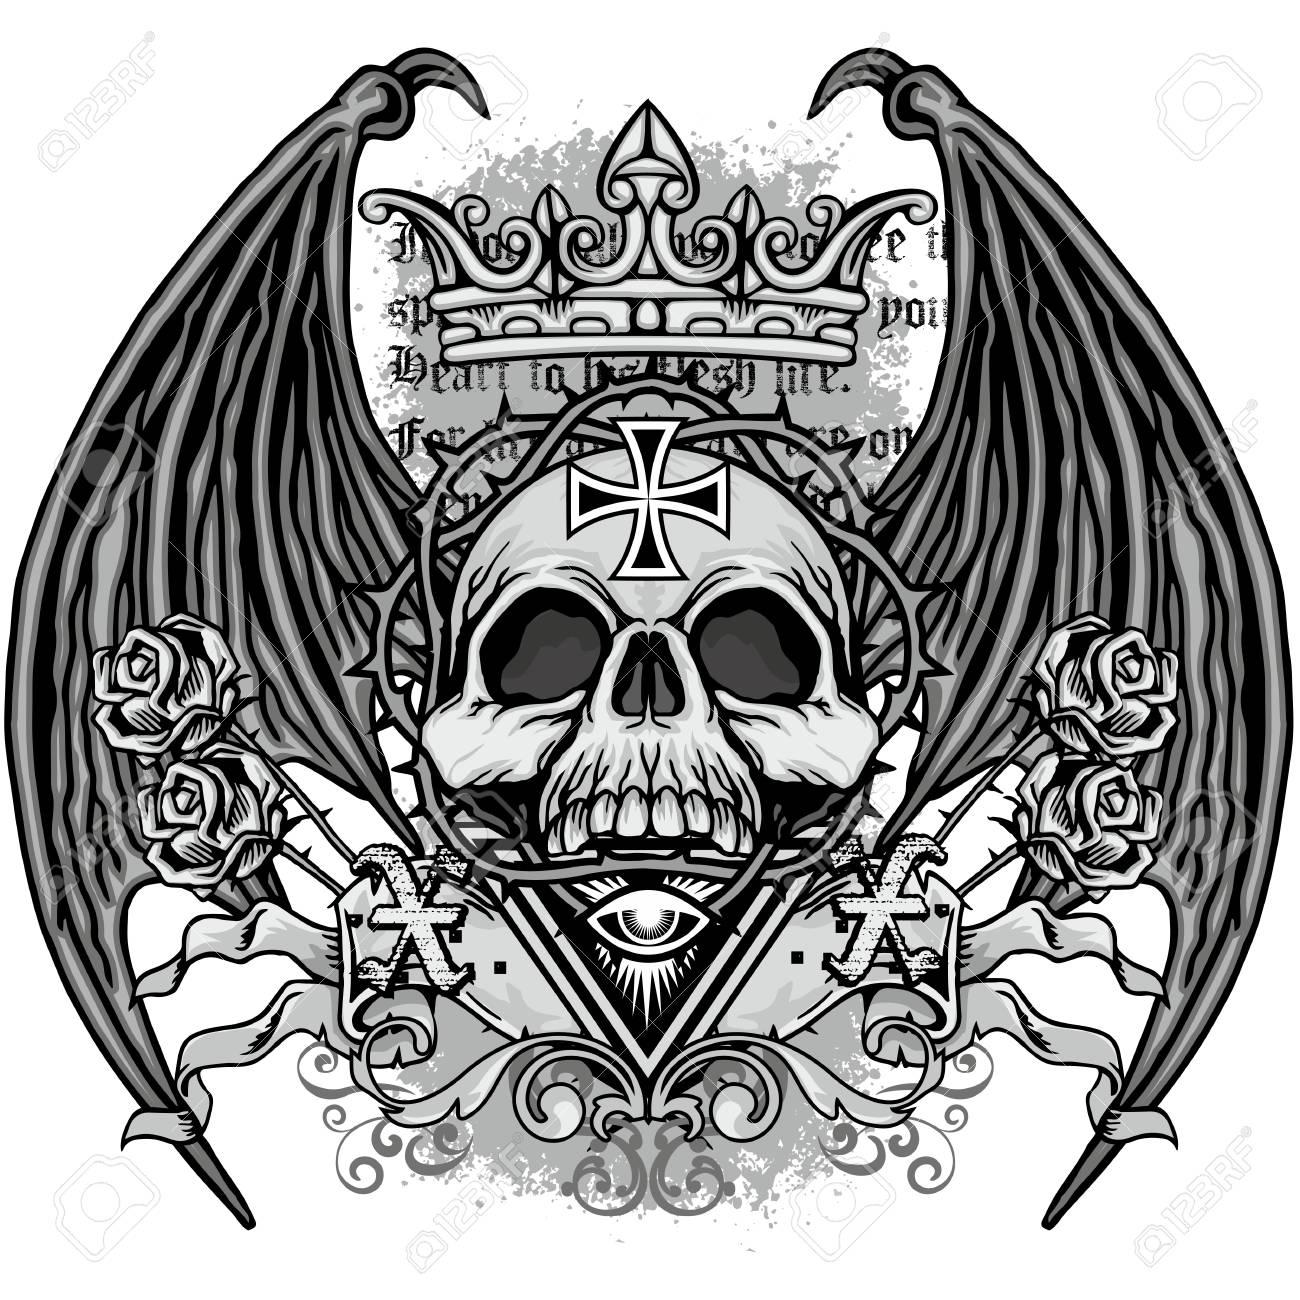 grunge skull coat of arms - 69010719